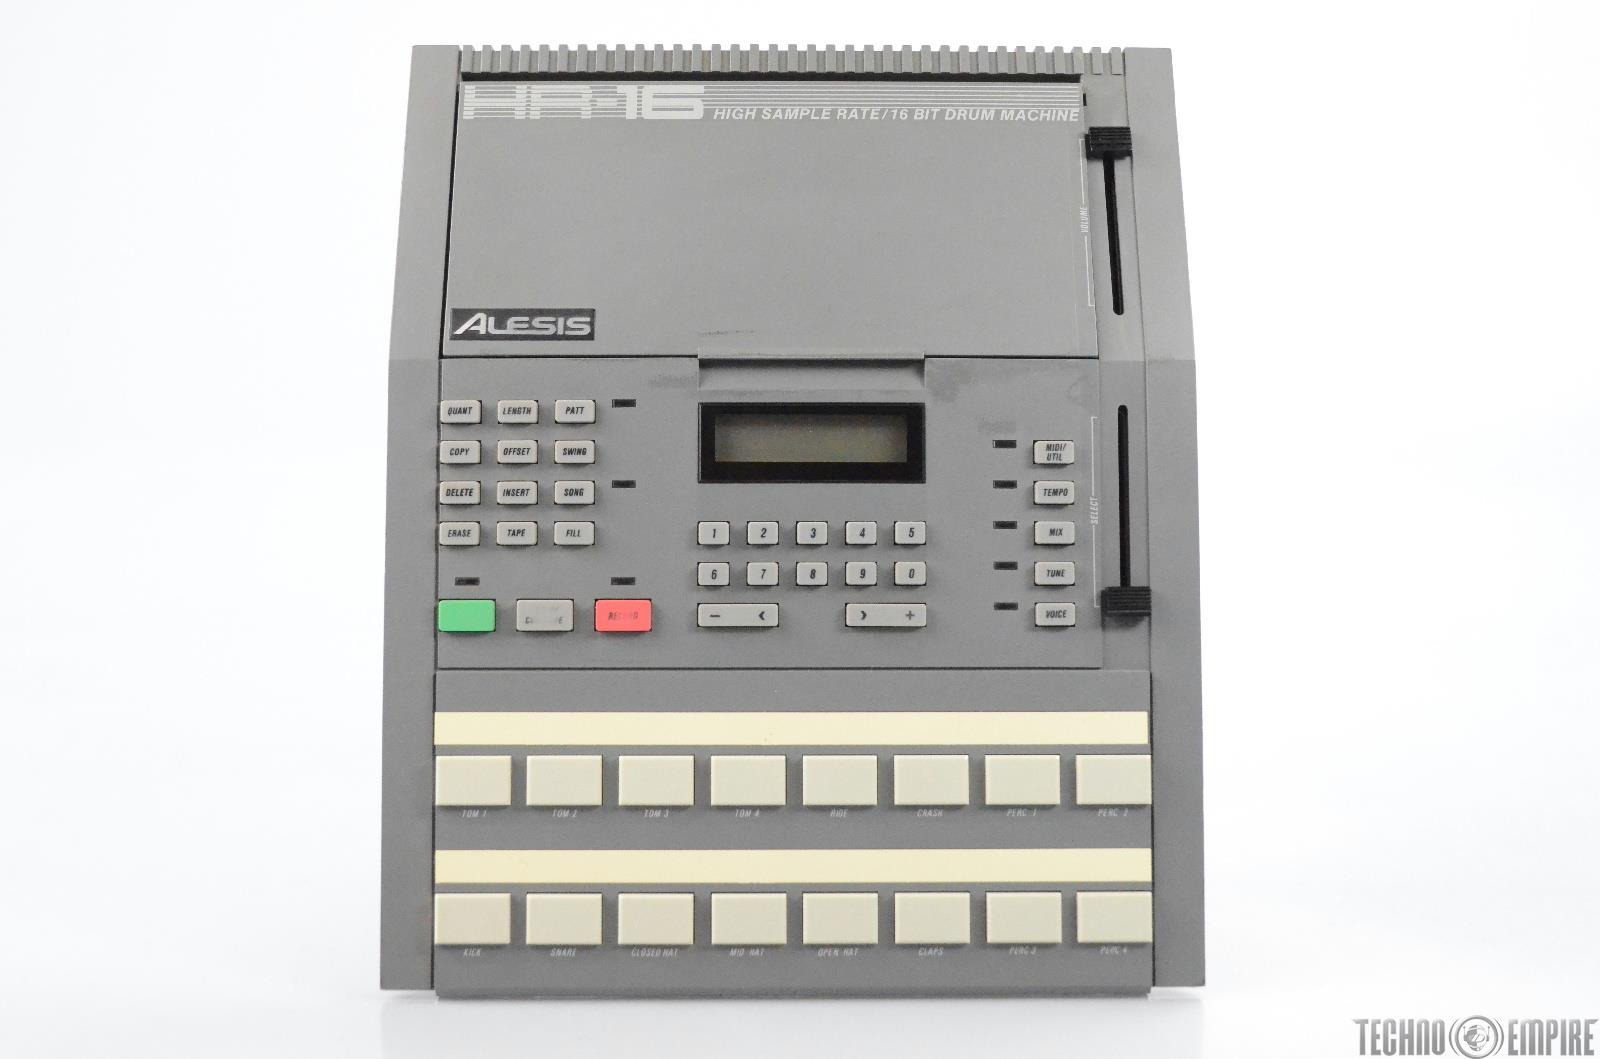 Alesis HR-16 Drum Machine 16-Bit MIDI In & Out For Parts or Repair HR16 #31090